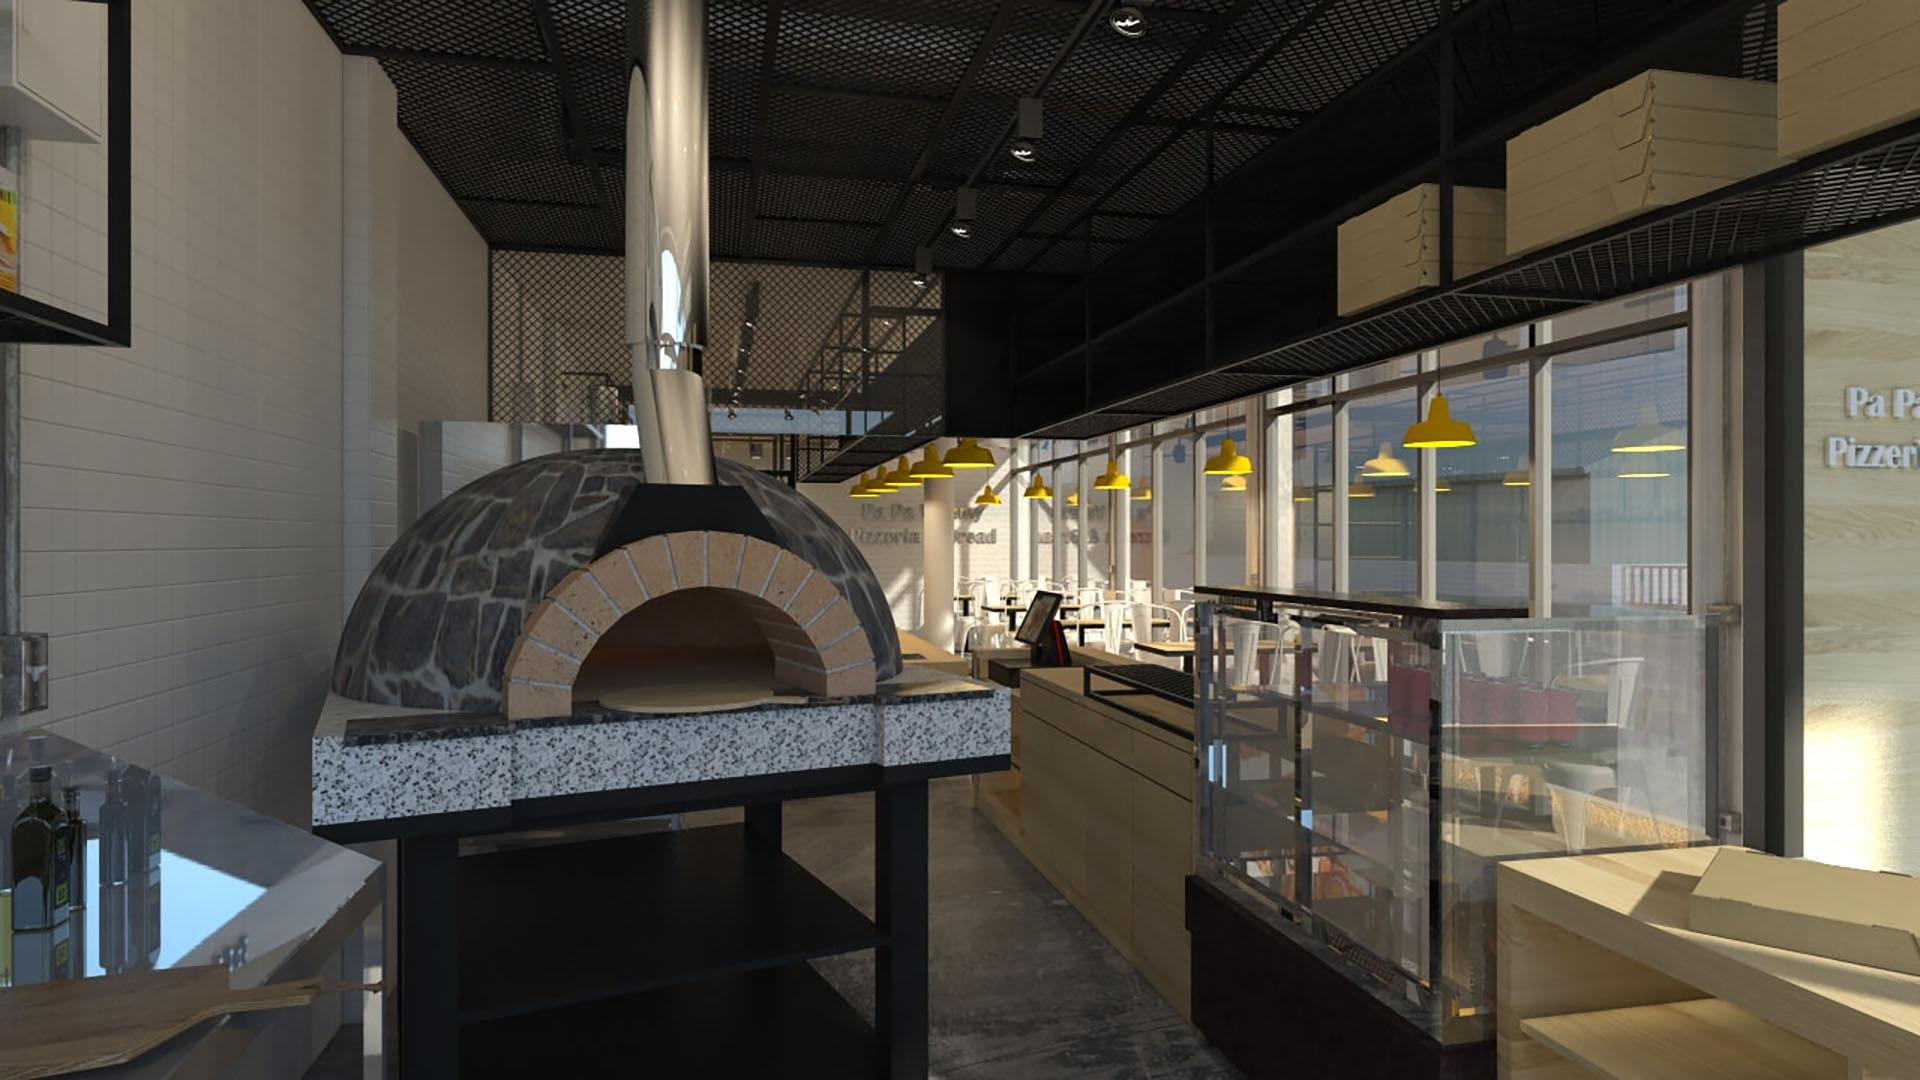 pizza店設計,餐廳設計,工業風,商業空間,義大利麵,義式比薩店